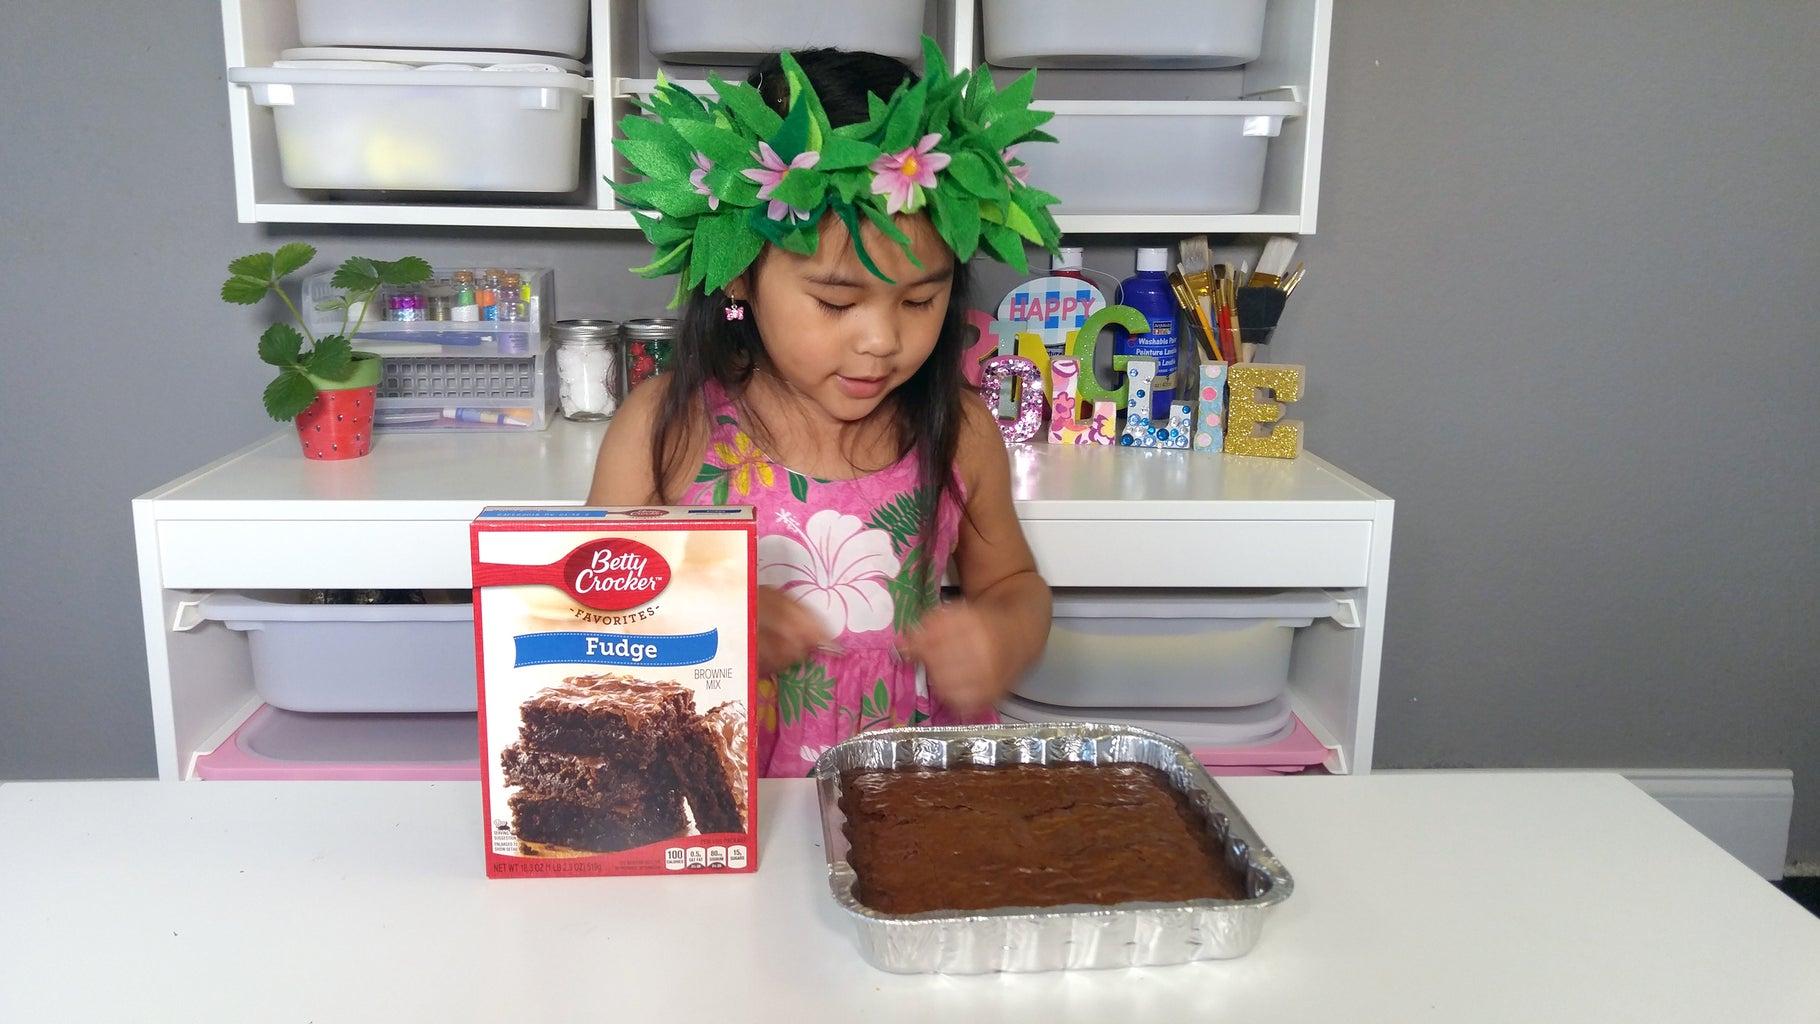 Make the Brownie (or Cake)